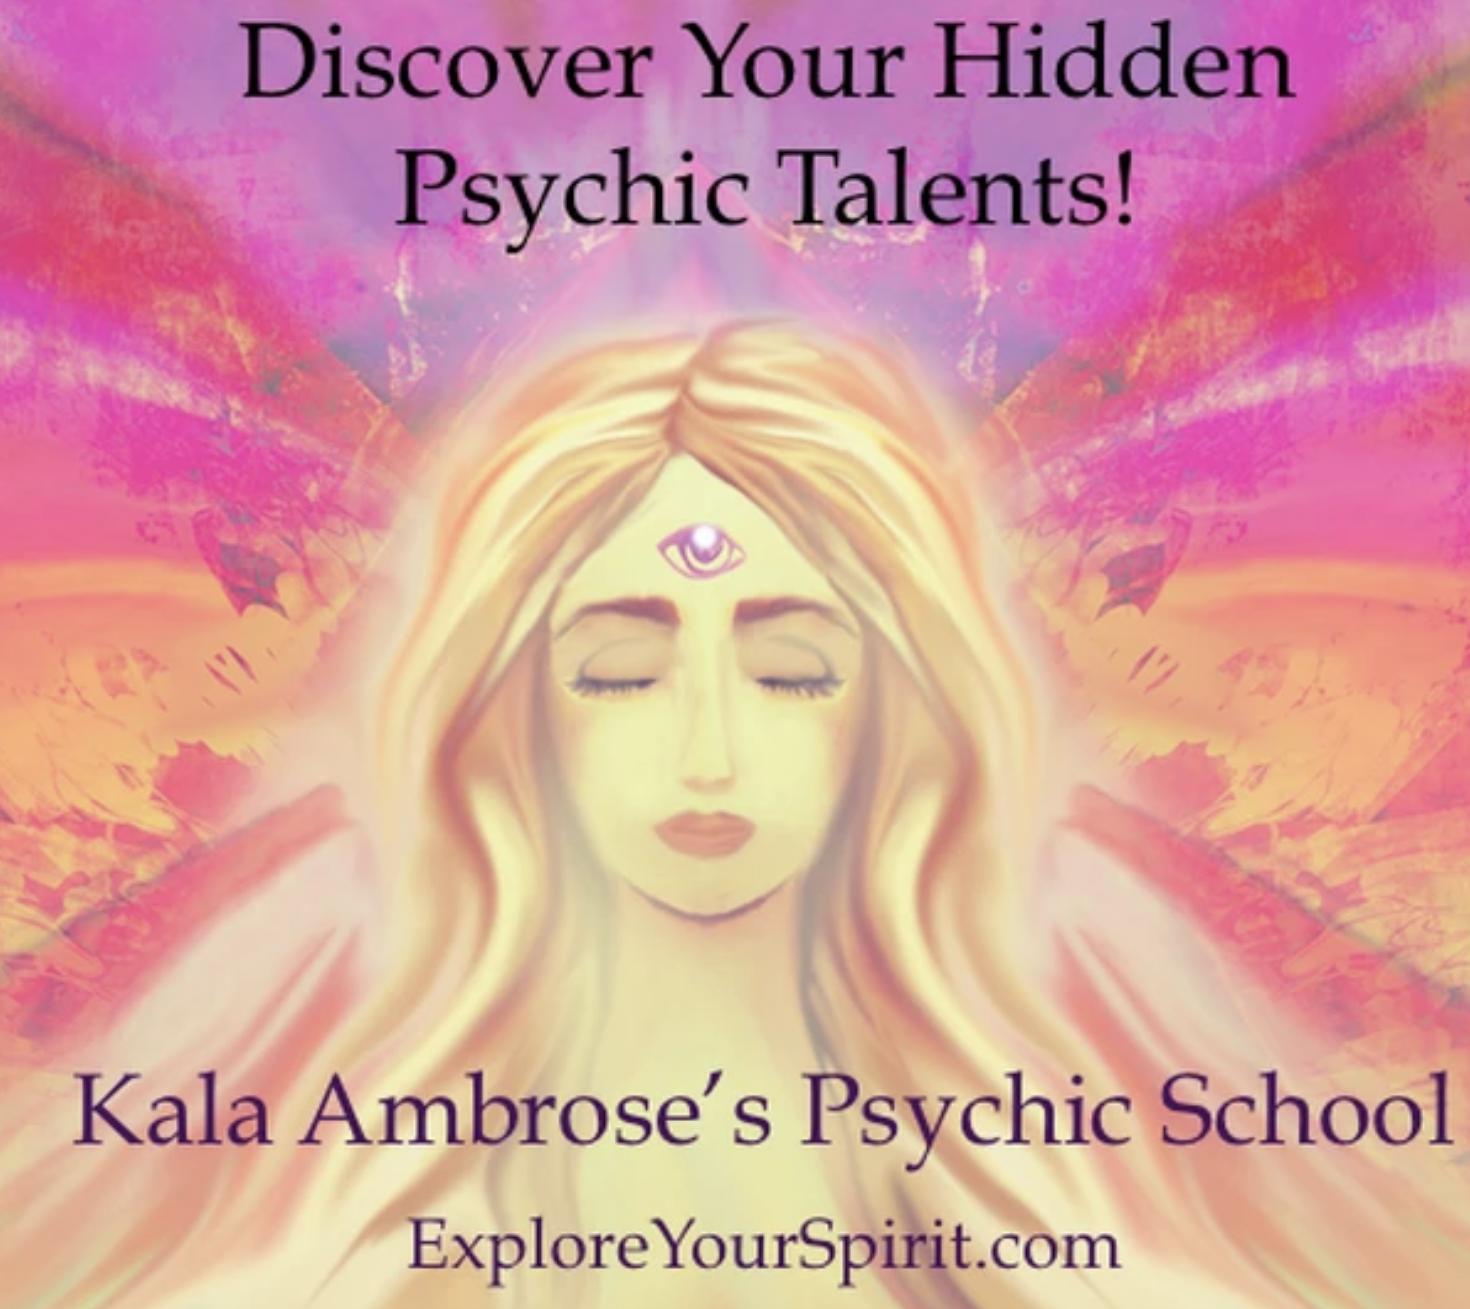 Psychic School